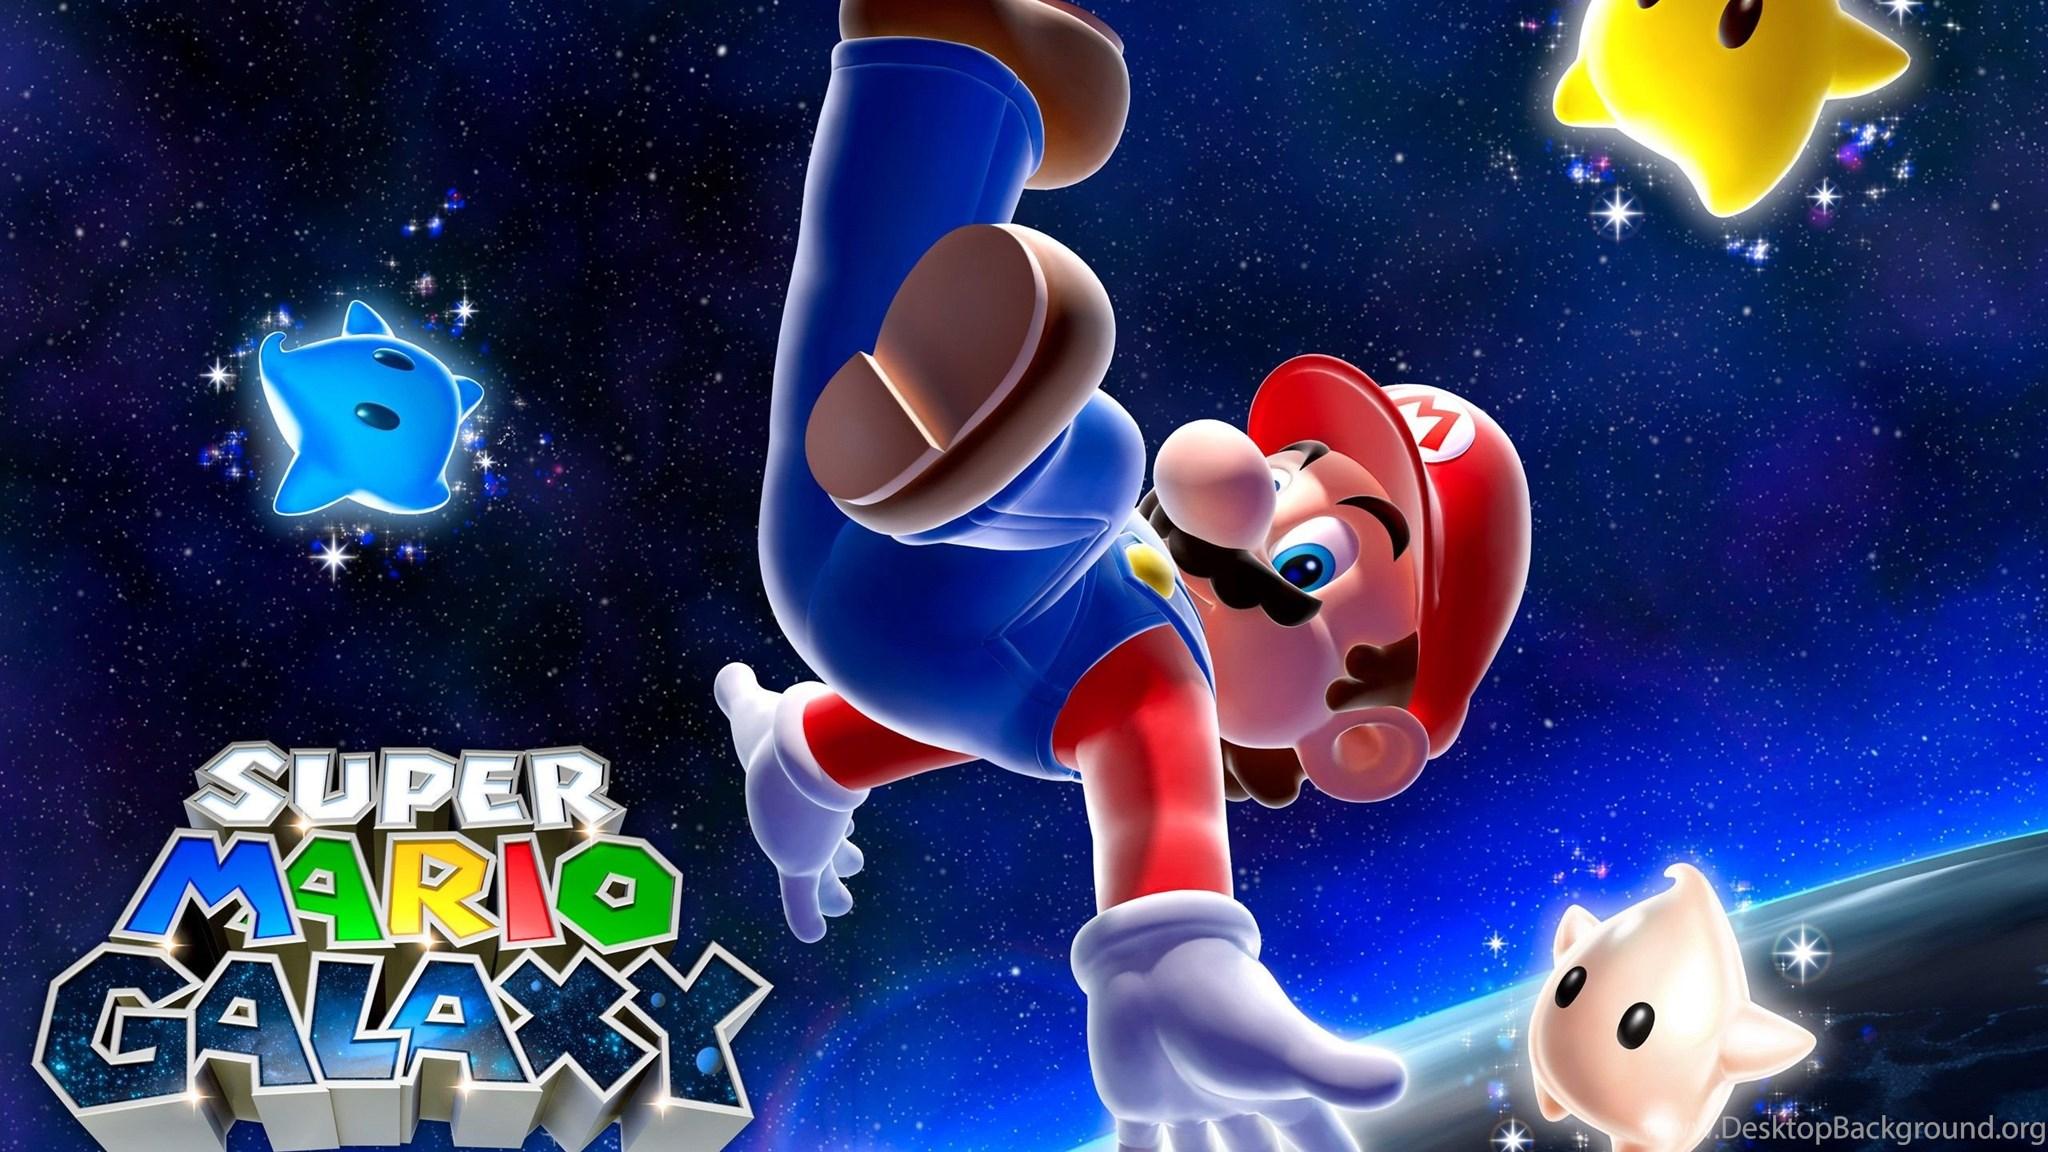 Super Mario Galaxy Computer Wallpapers Desktop Backgrounds